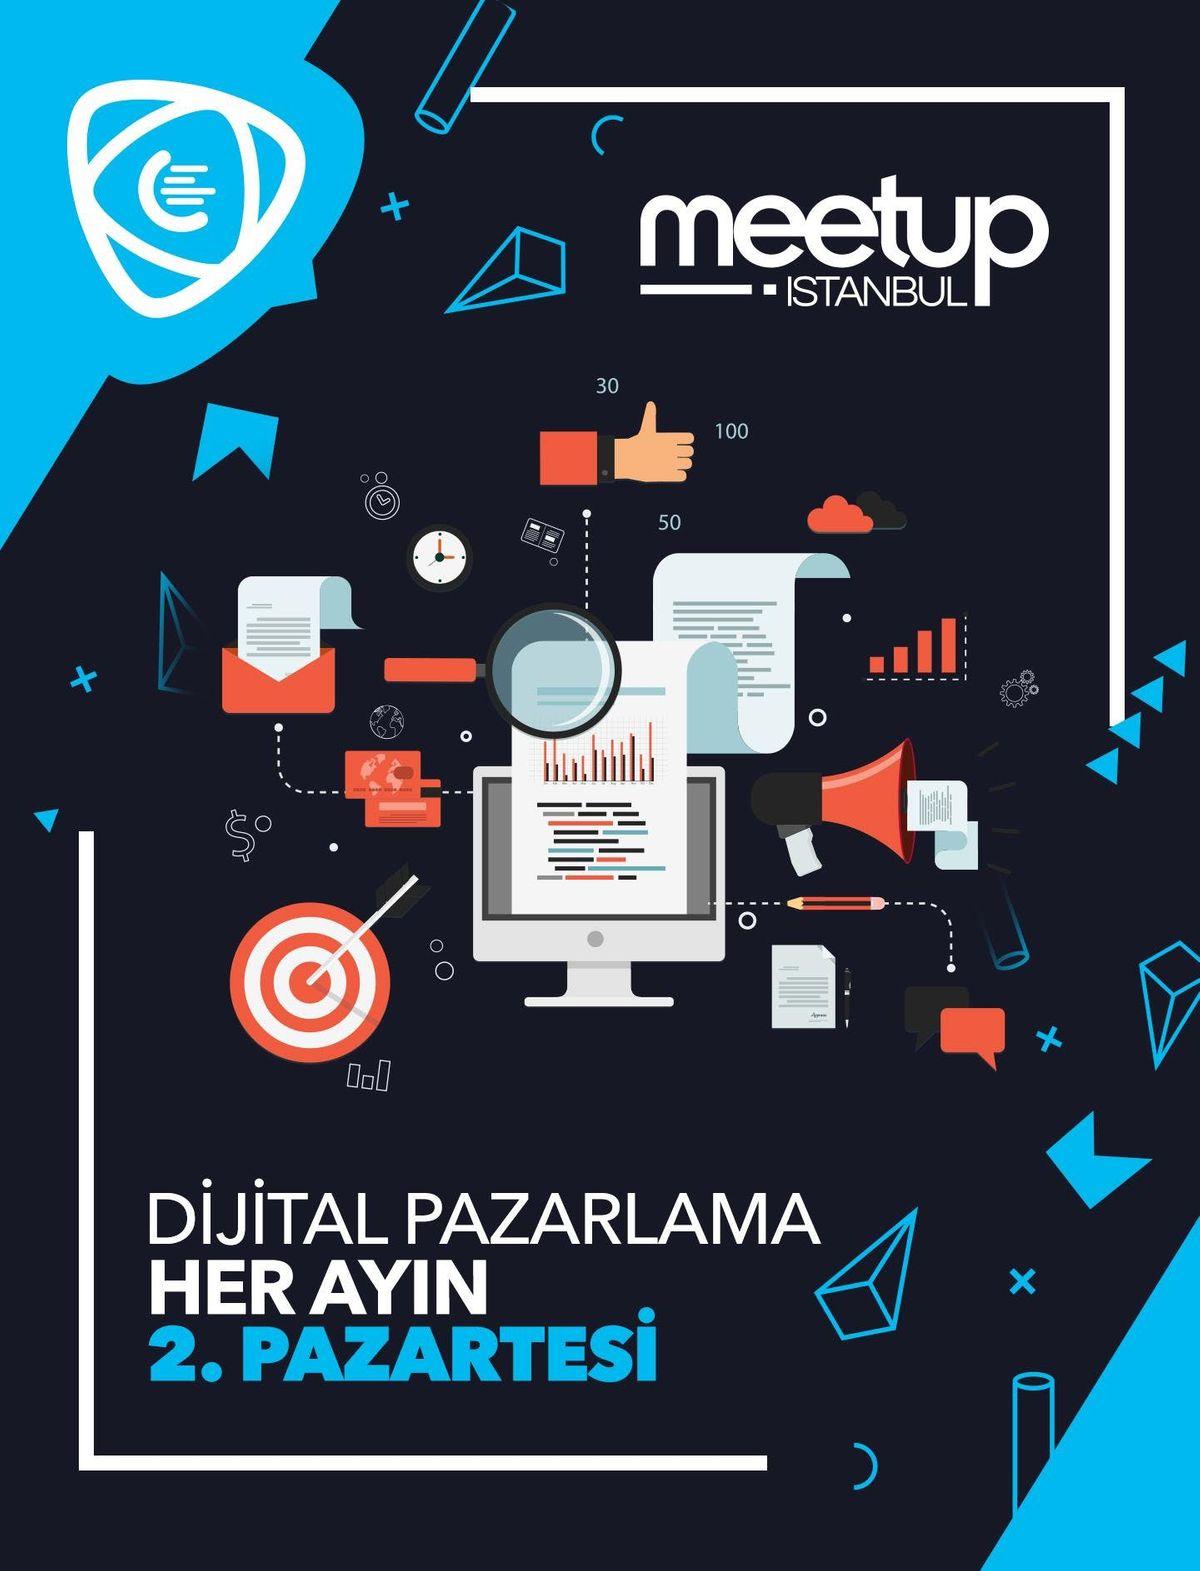 Dijital Pazarlama - Meetup stanbul